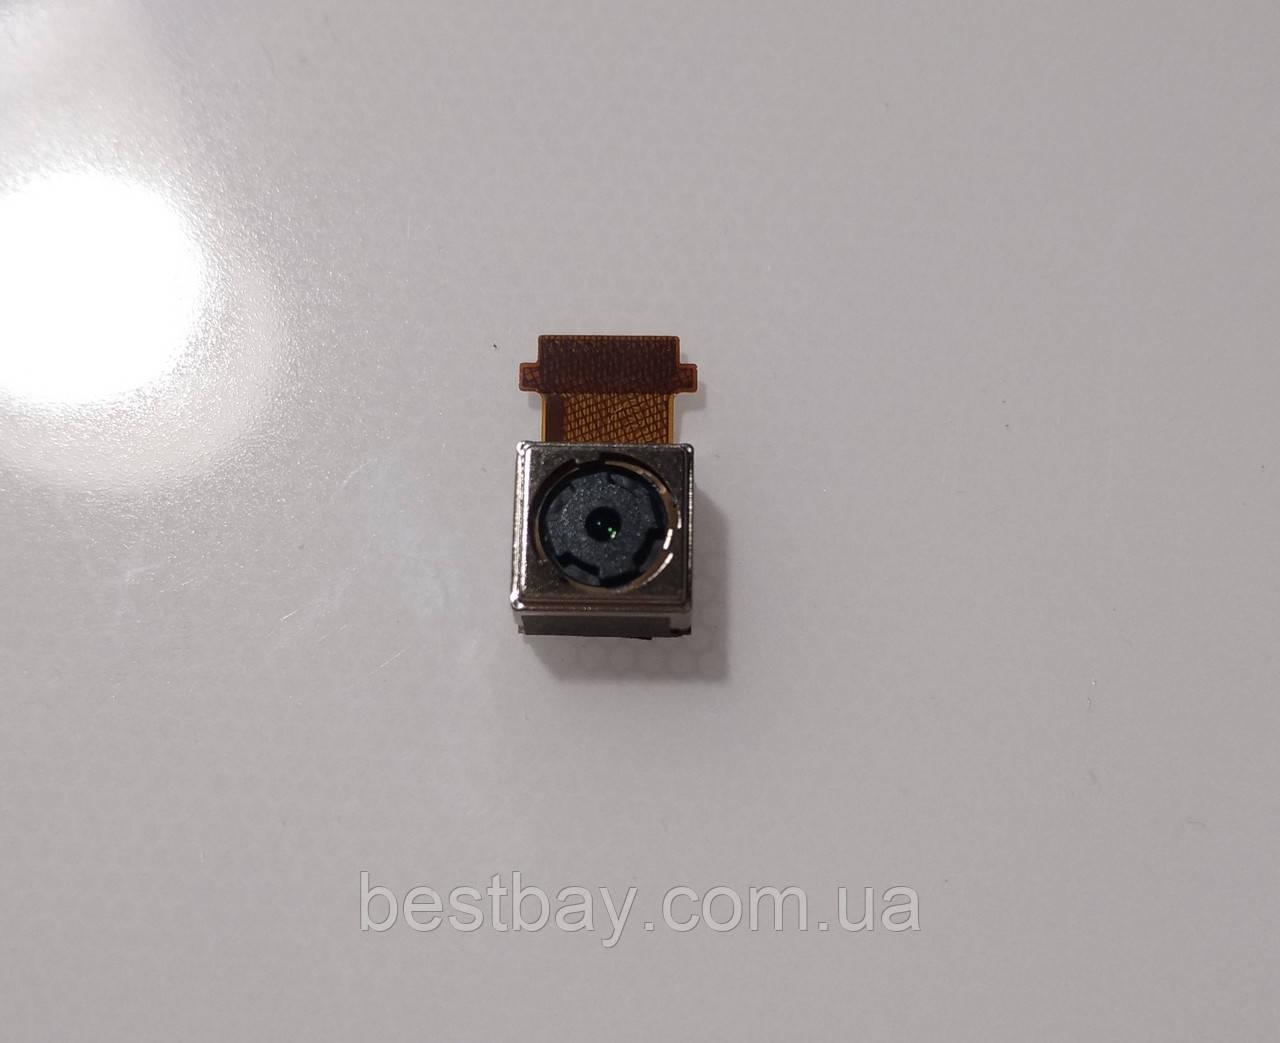 Asus ZenFone 5 камера основная